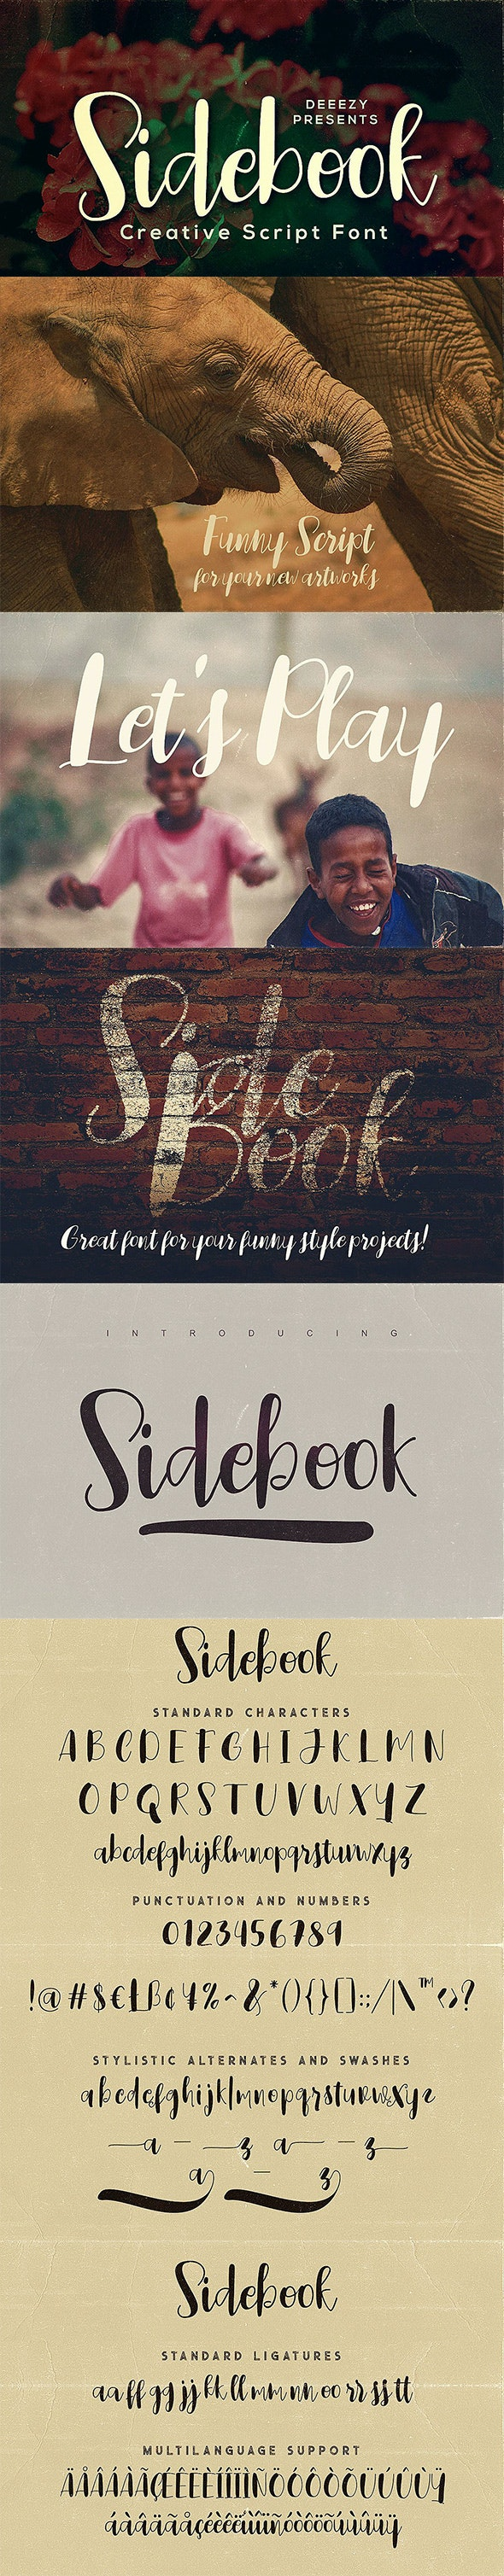 Sidebook Script Font - Hand-writing Script